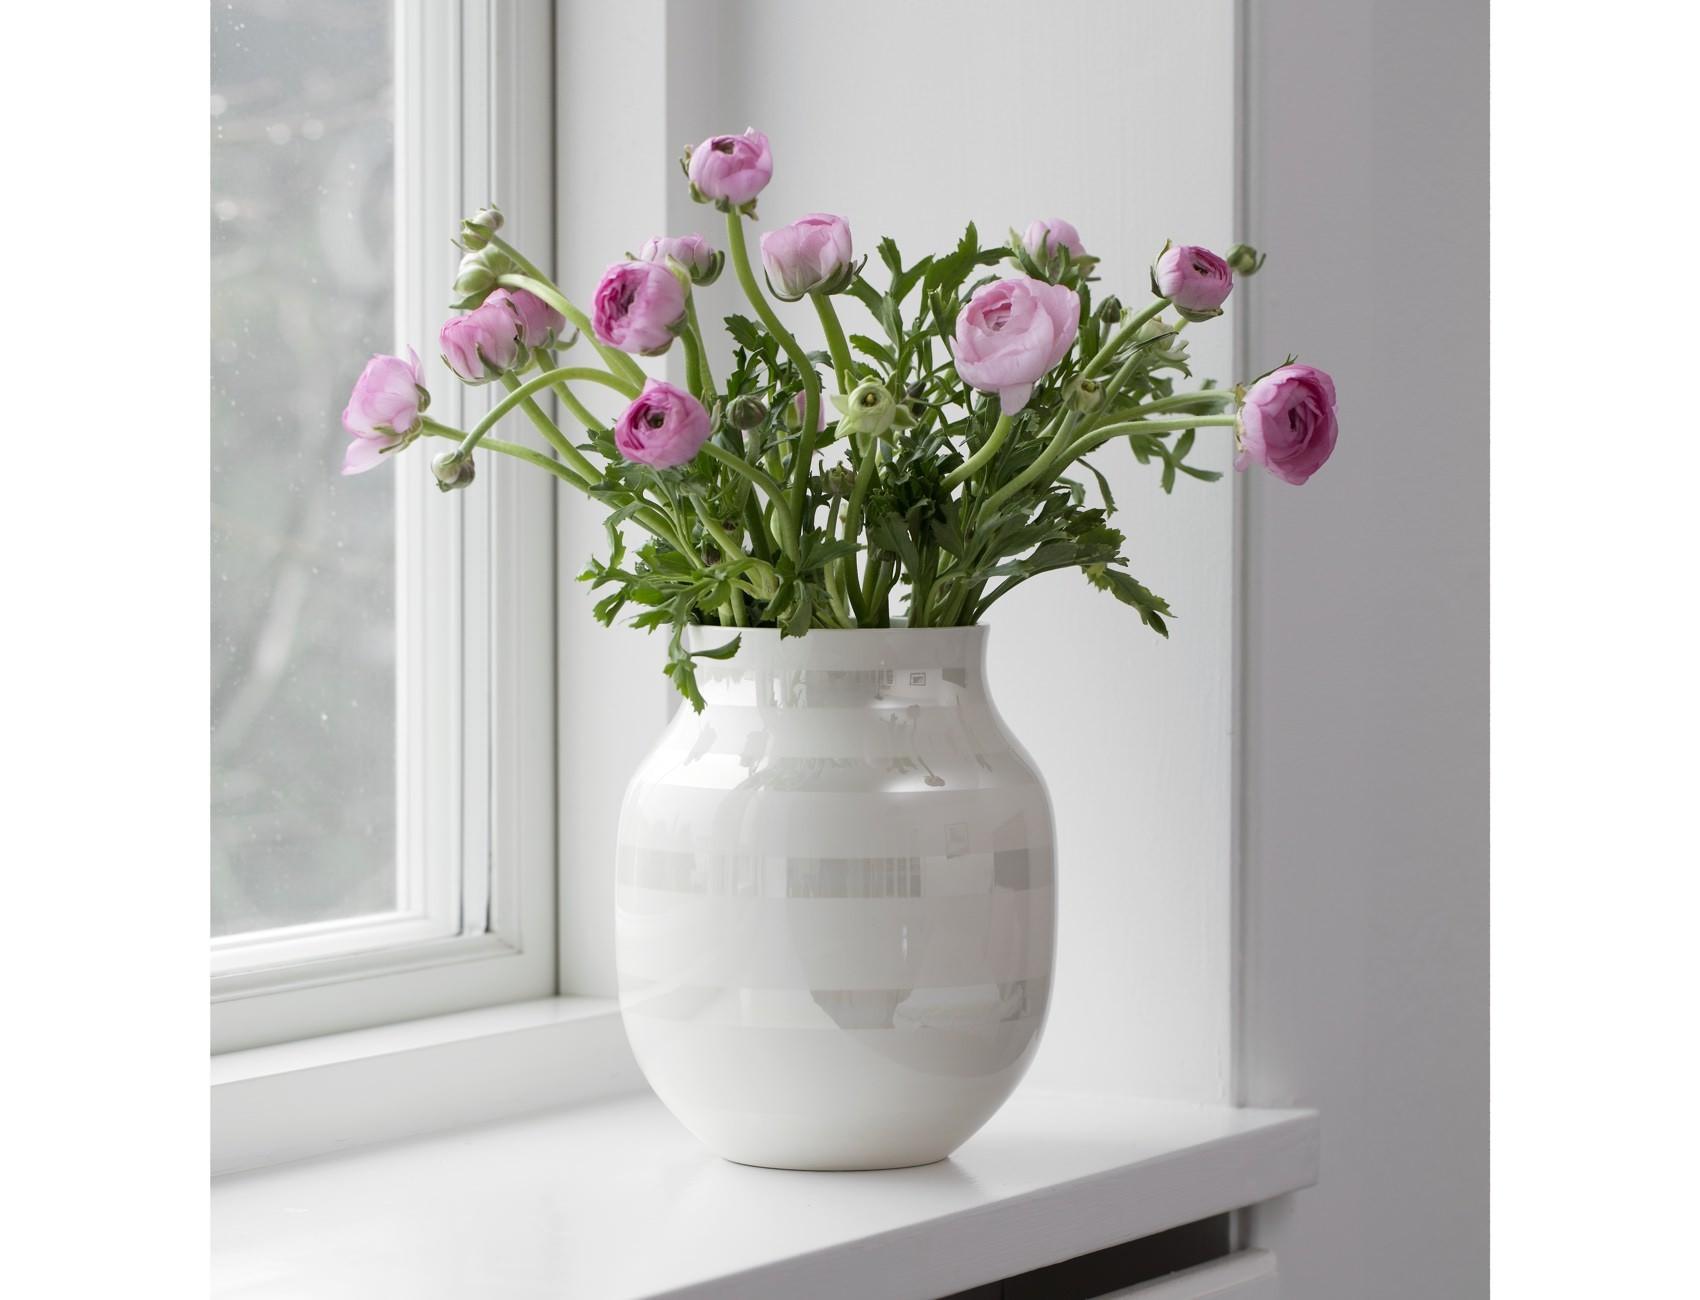 Kahler design omaggio vase mother of pearl new 2016 reviewsmspy